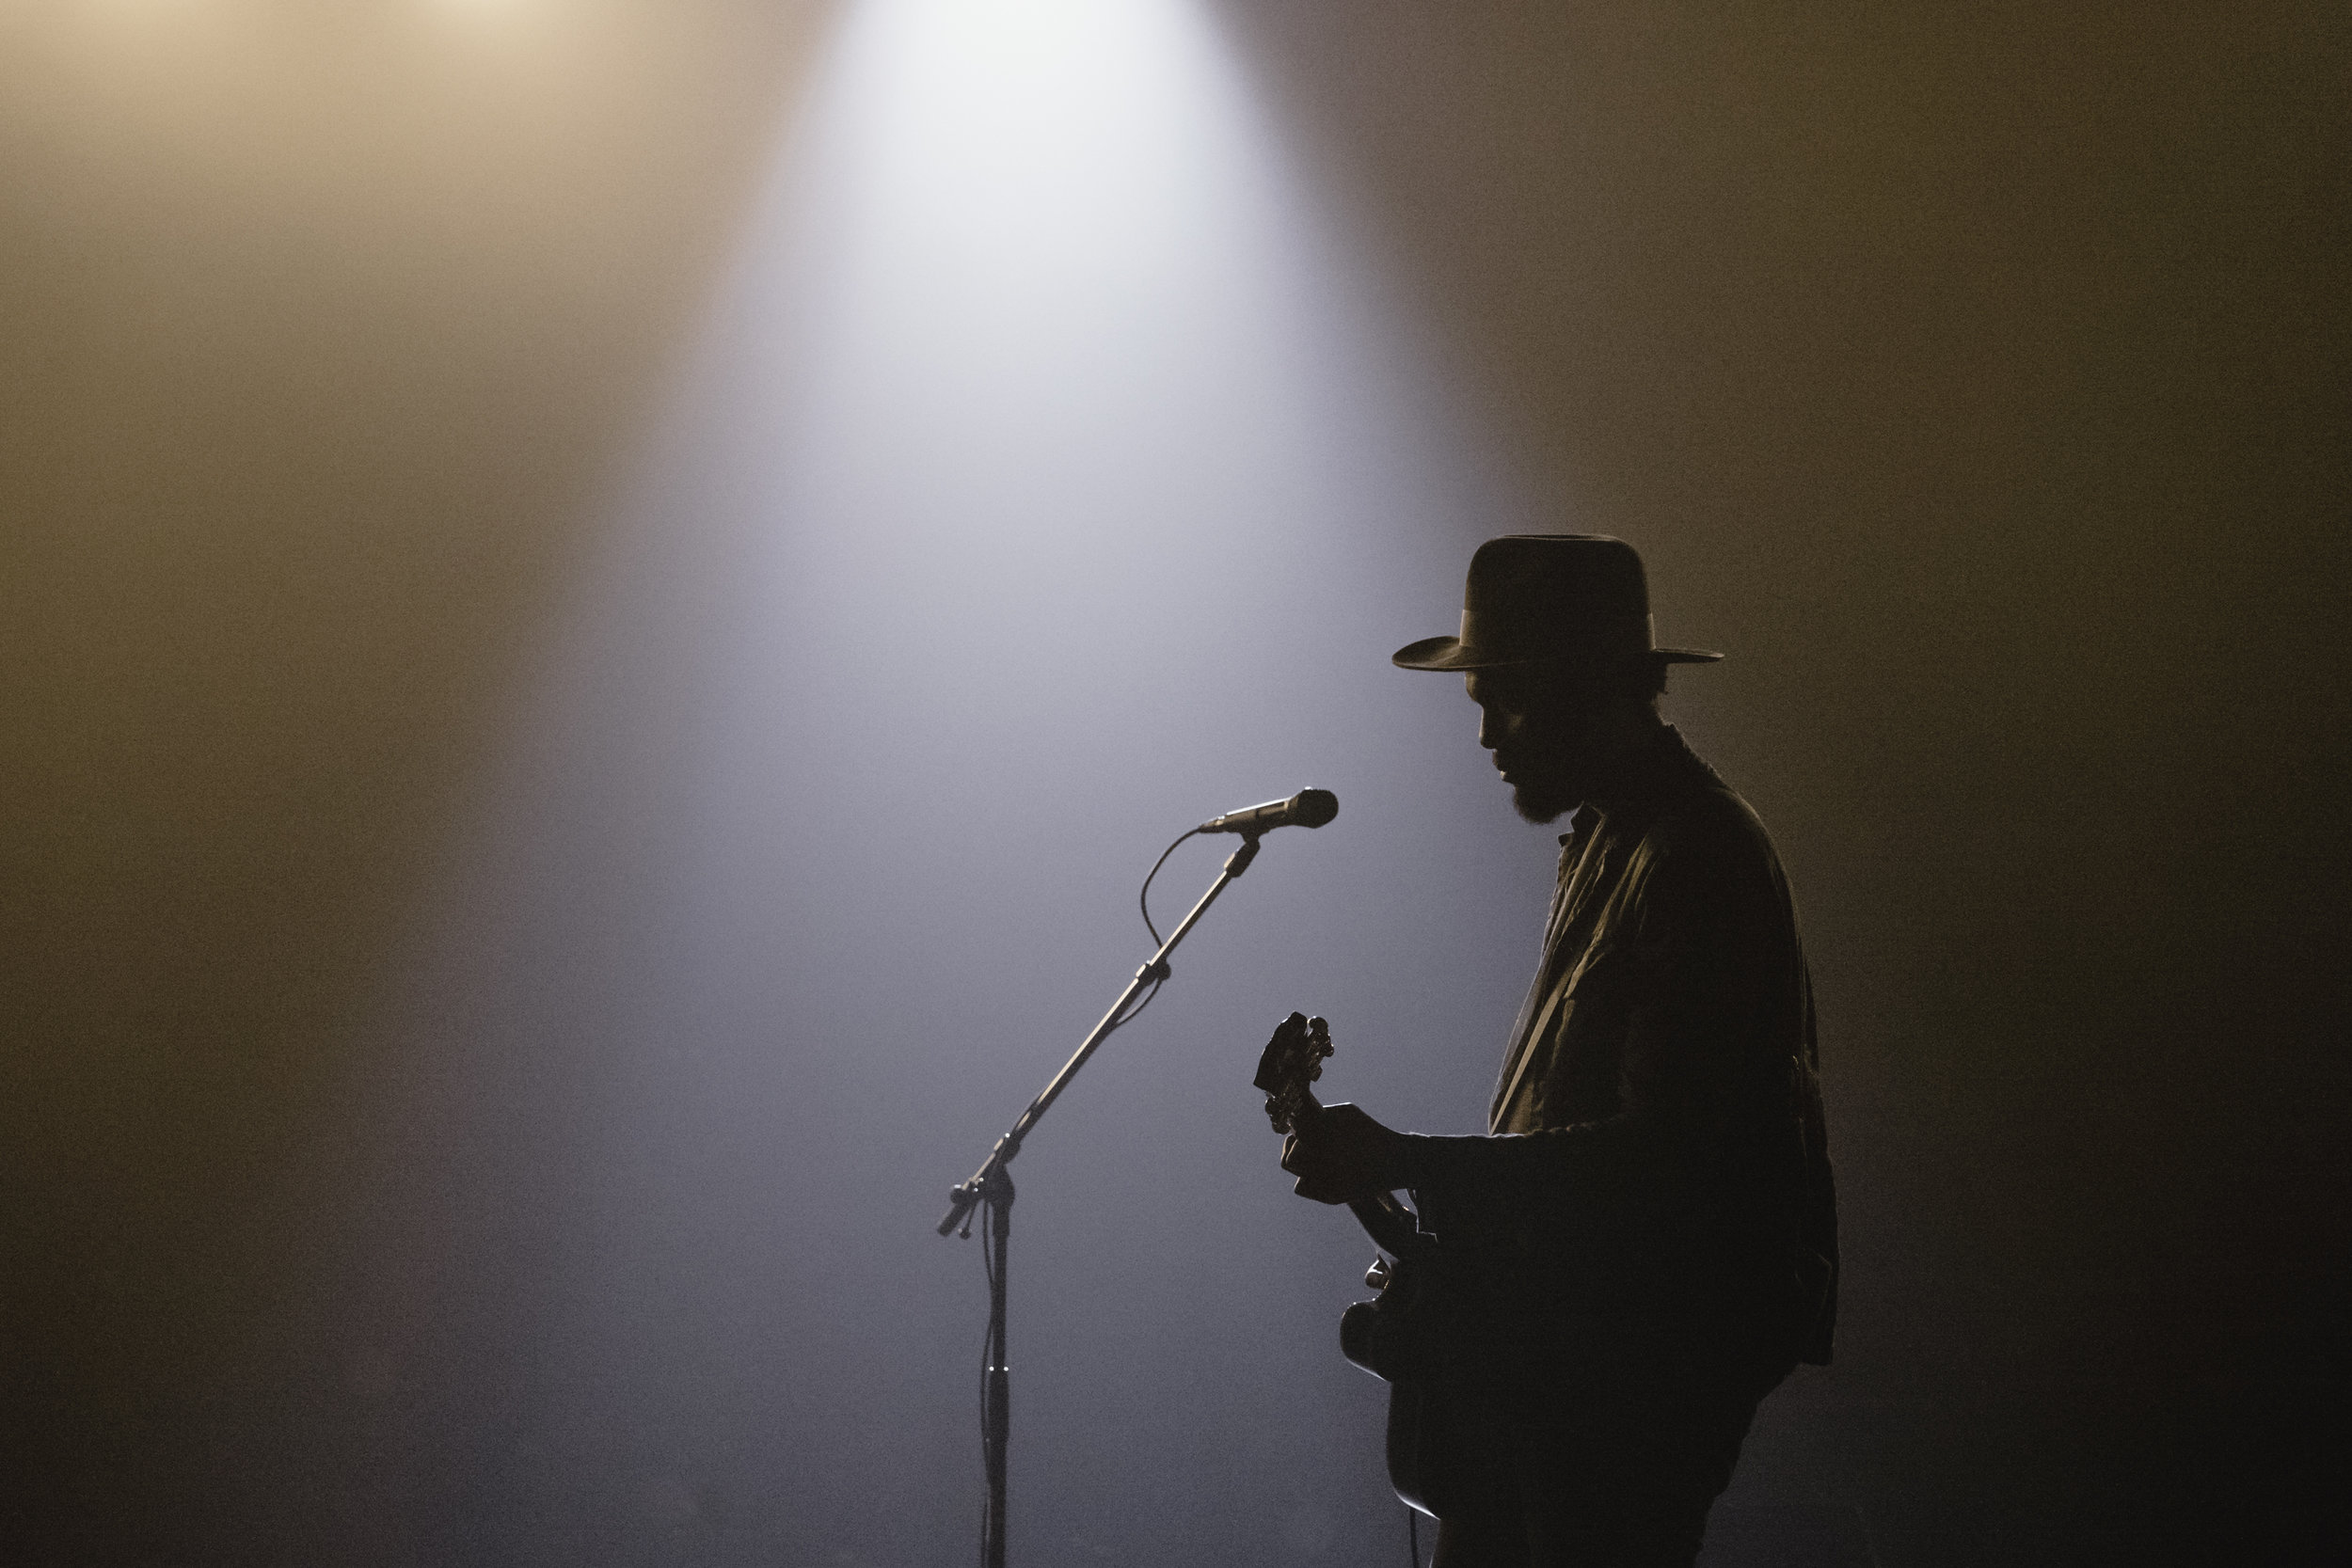 Gary Clark Jr on stage